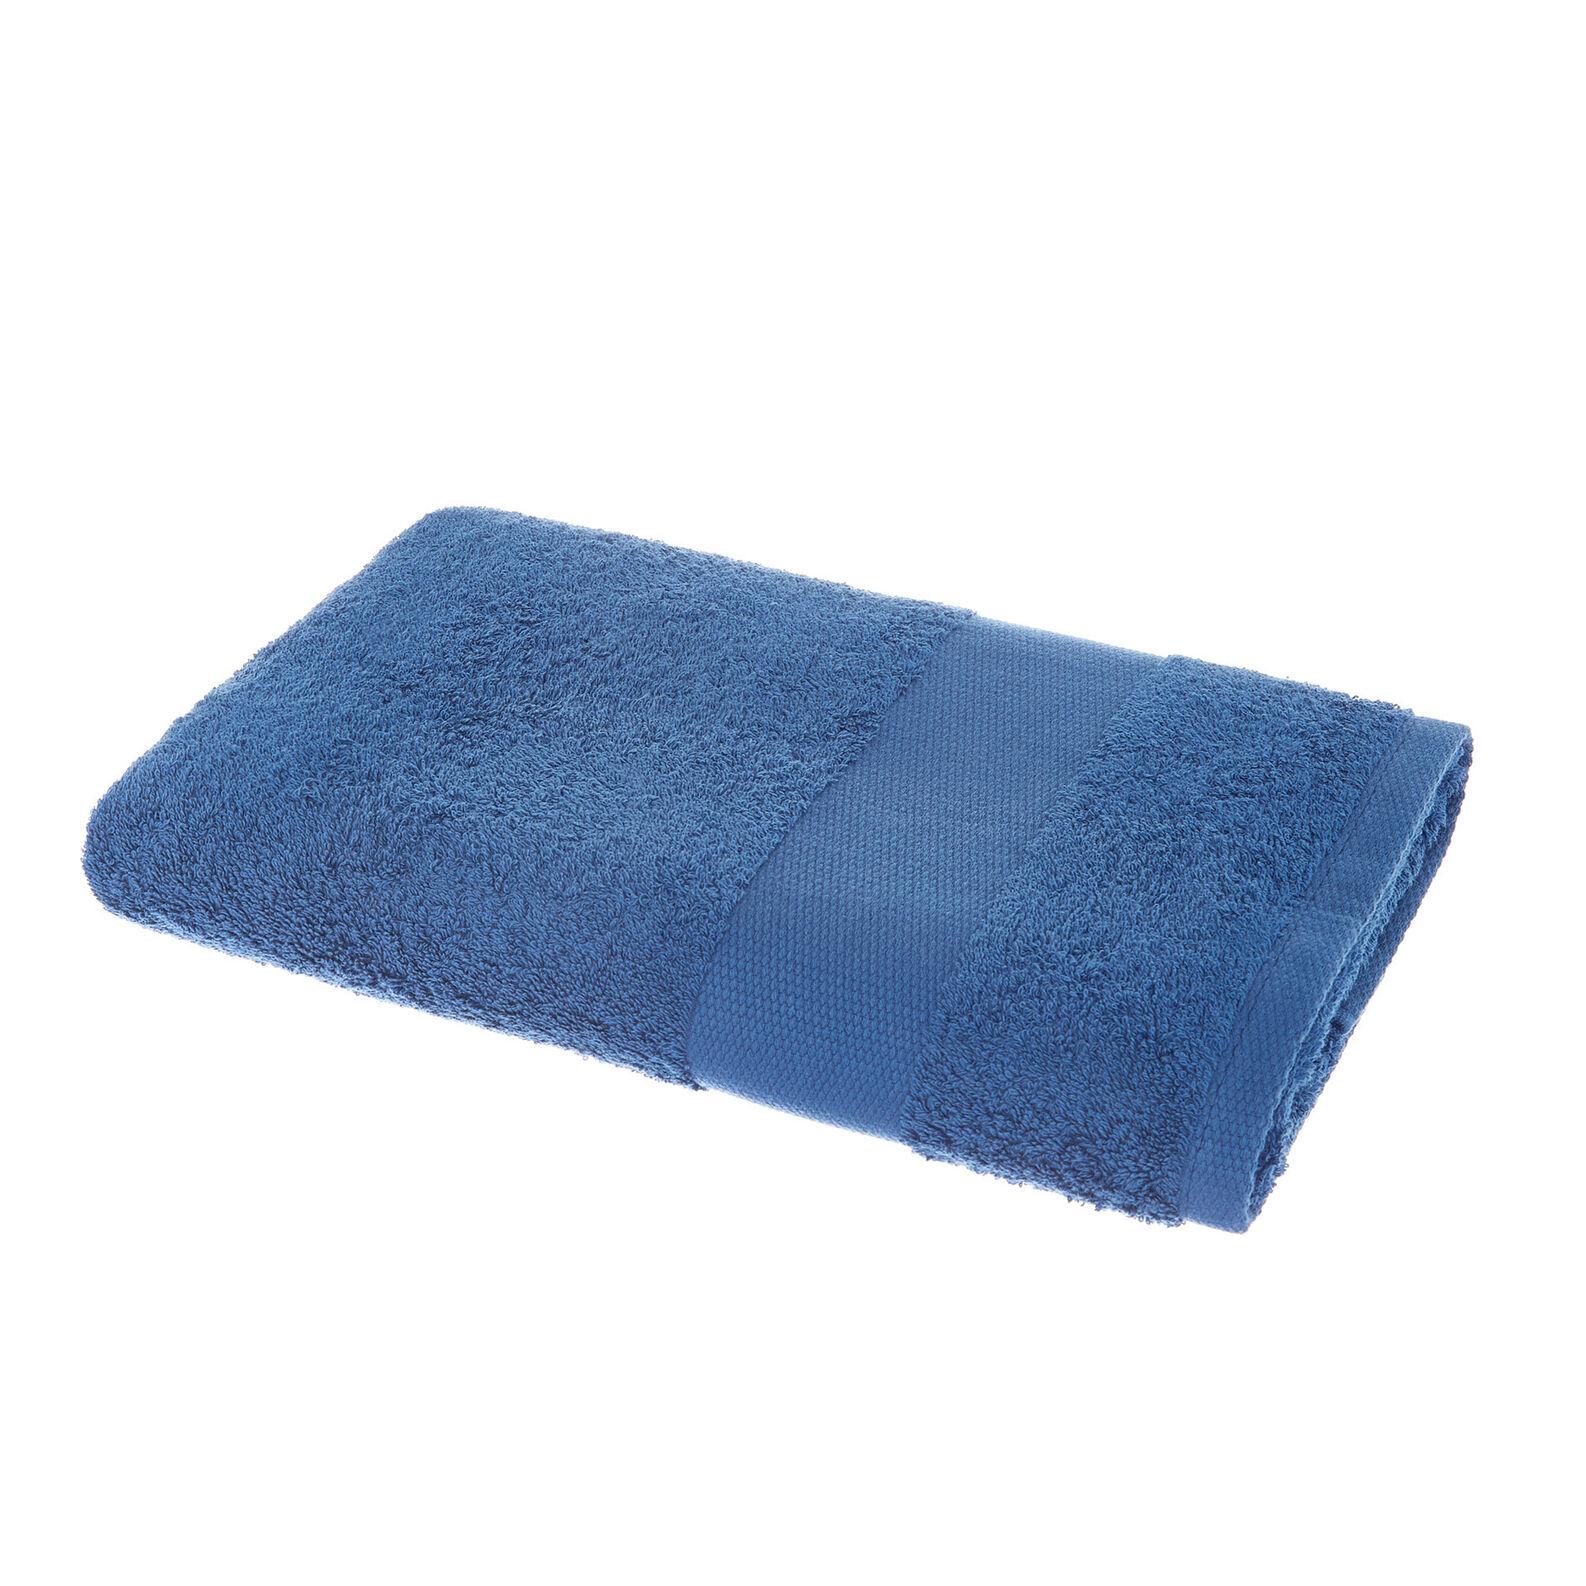 Zefiro pure cotton terry towel